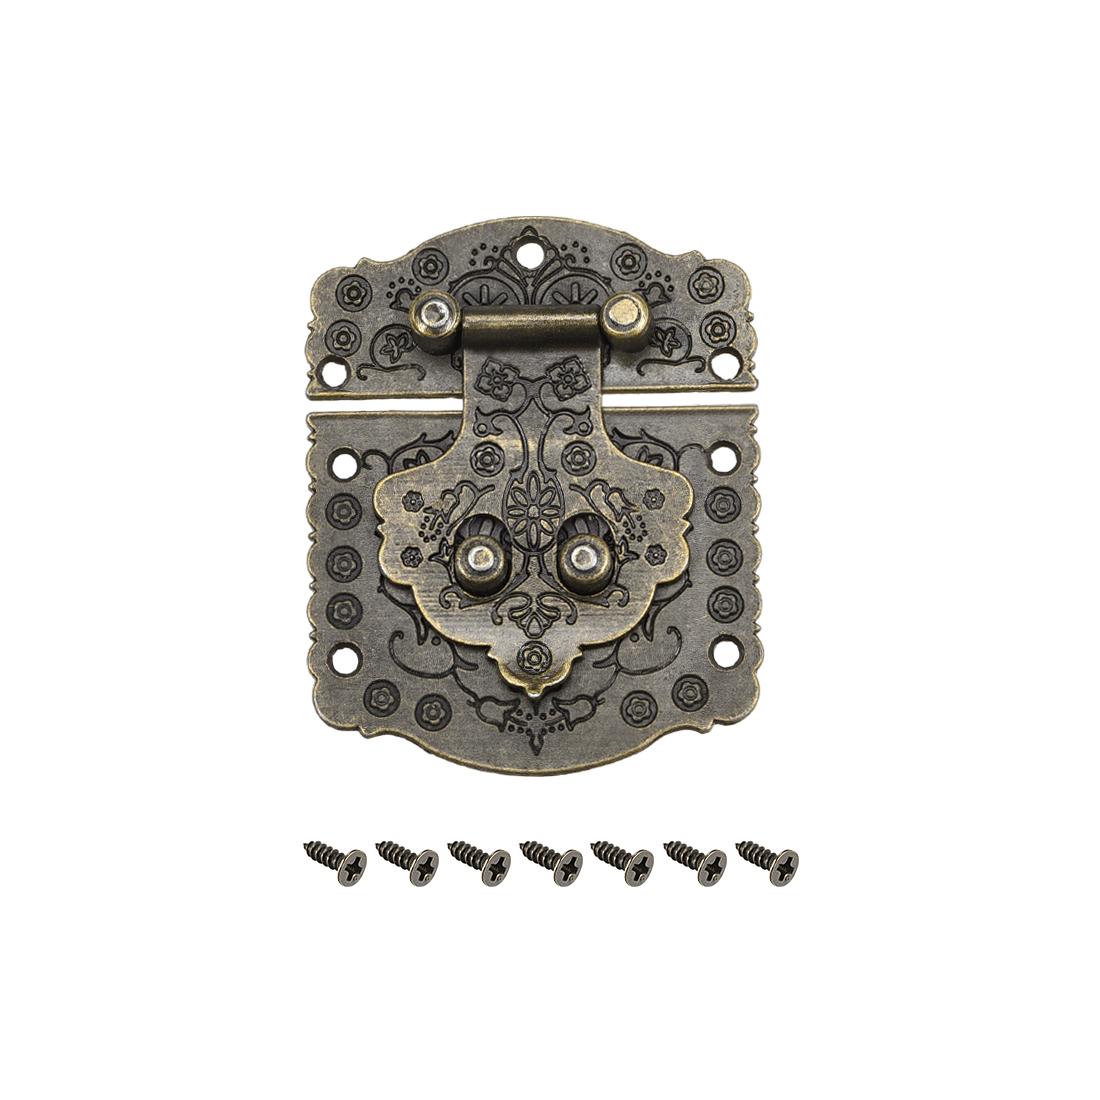 Wood Case Box Rectangle Hasp 73x60mm Antique Latches Hook Bronze Tone, 5 Pcs